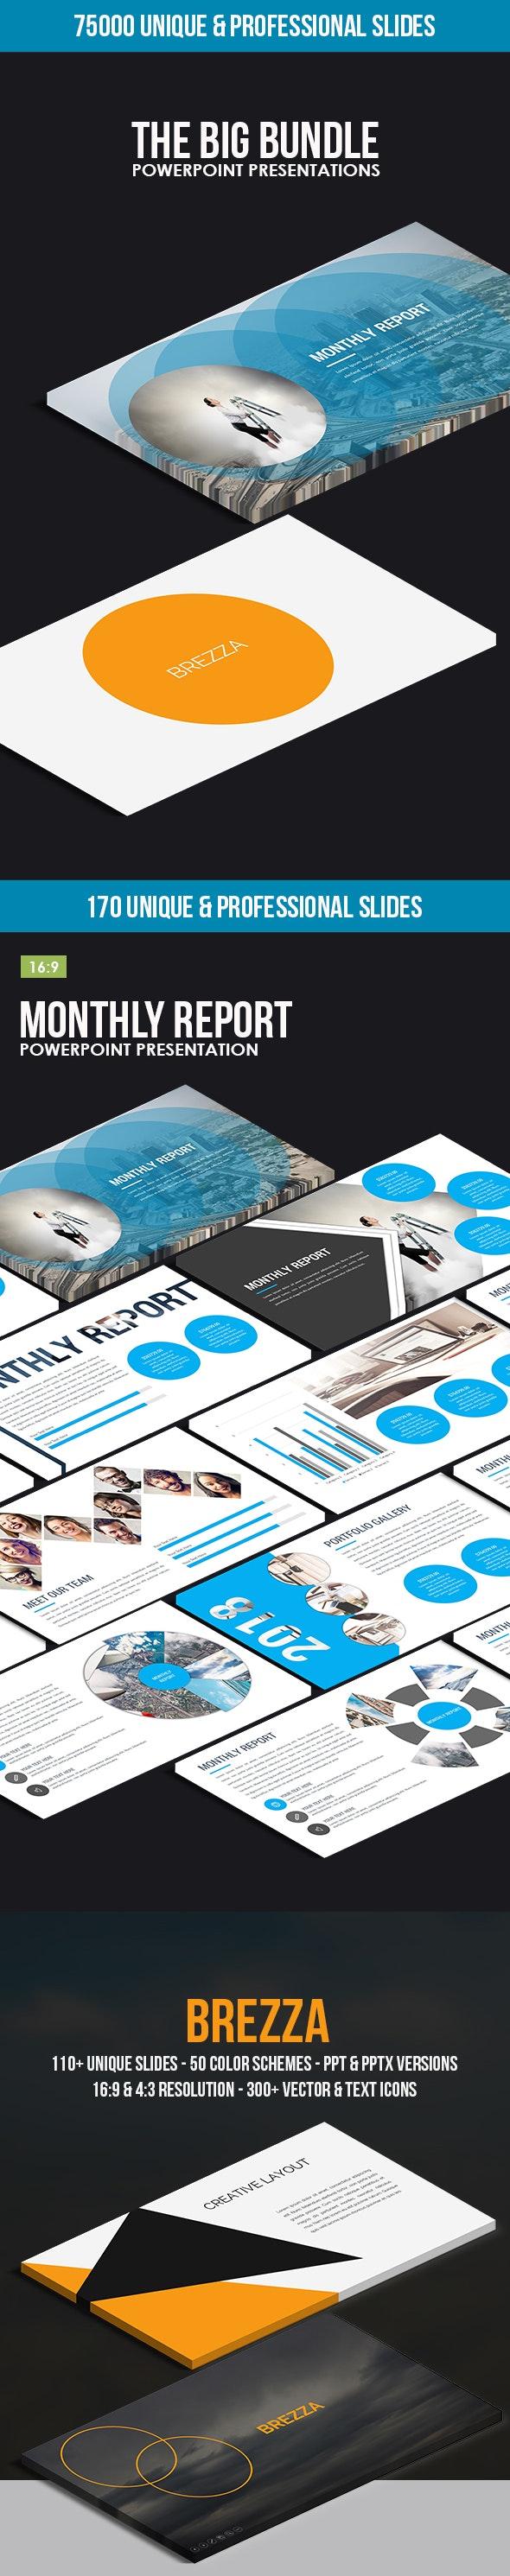 The Big Bundle - Powerpoint Presentations - Business PowerPoint Templates